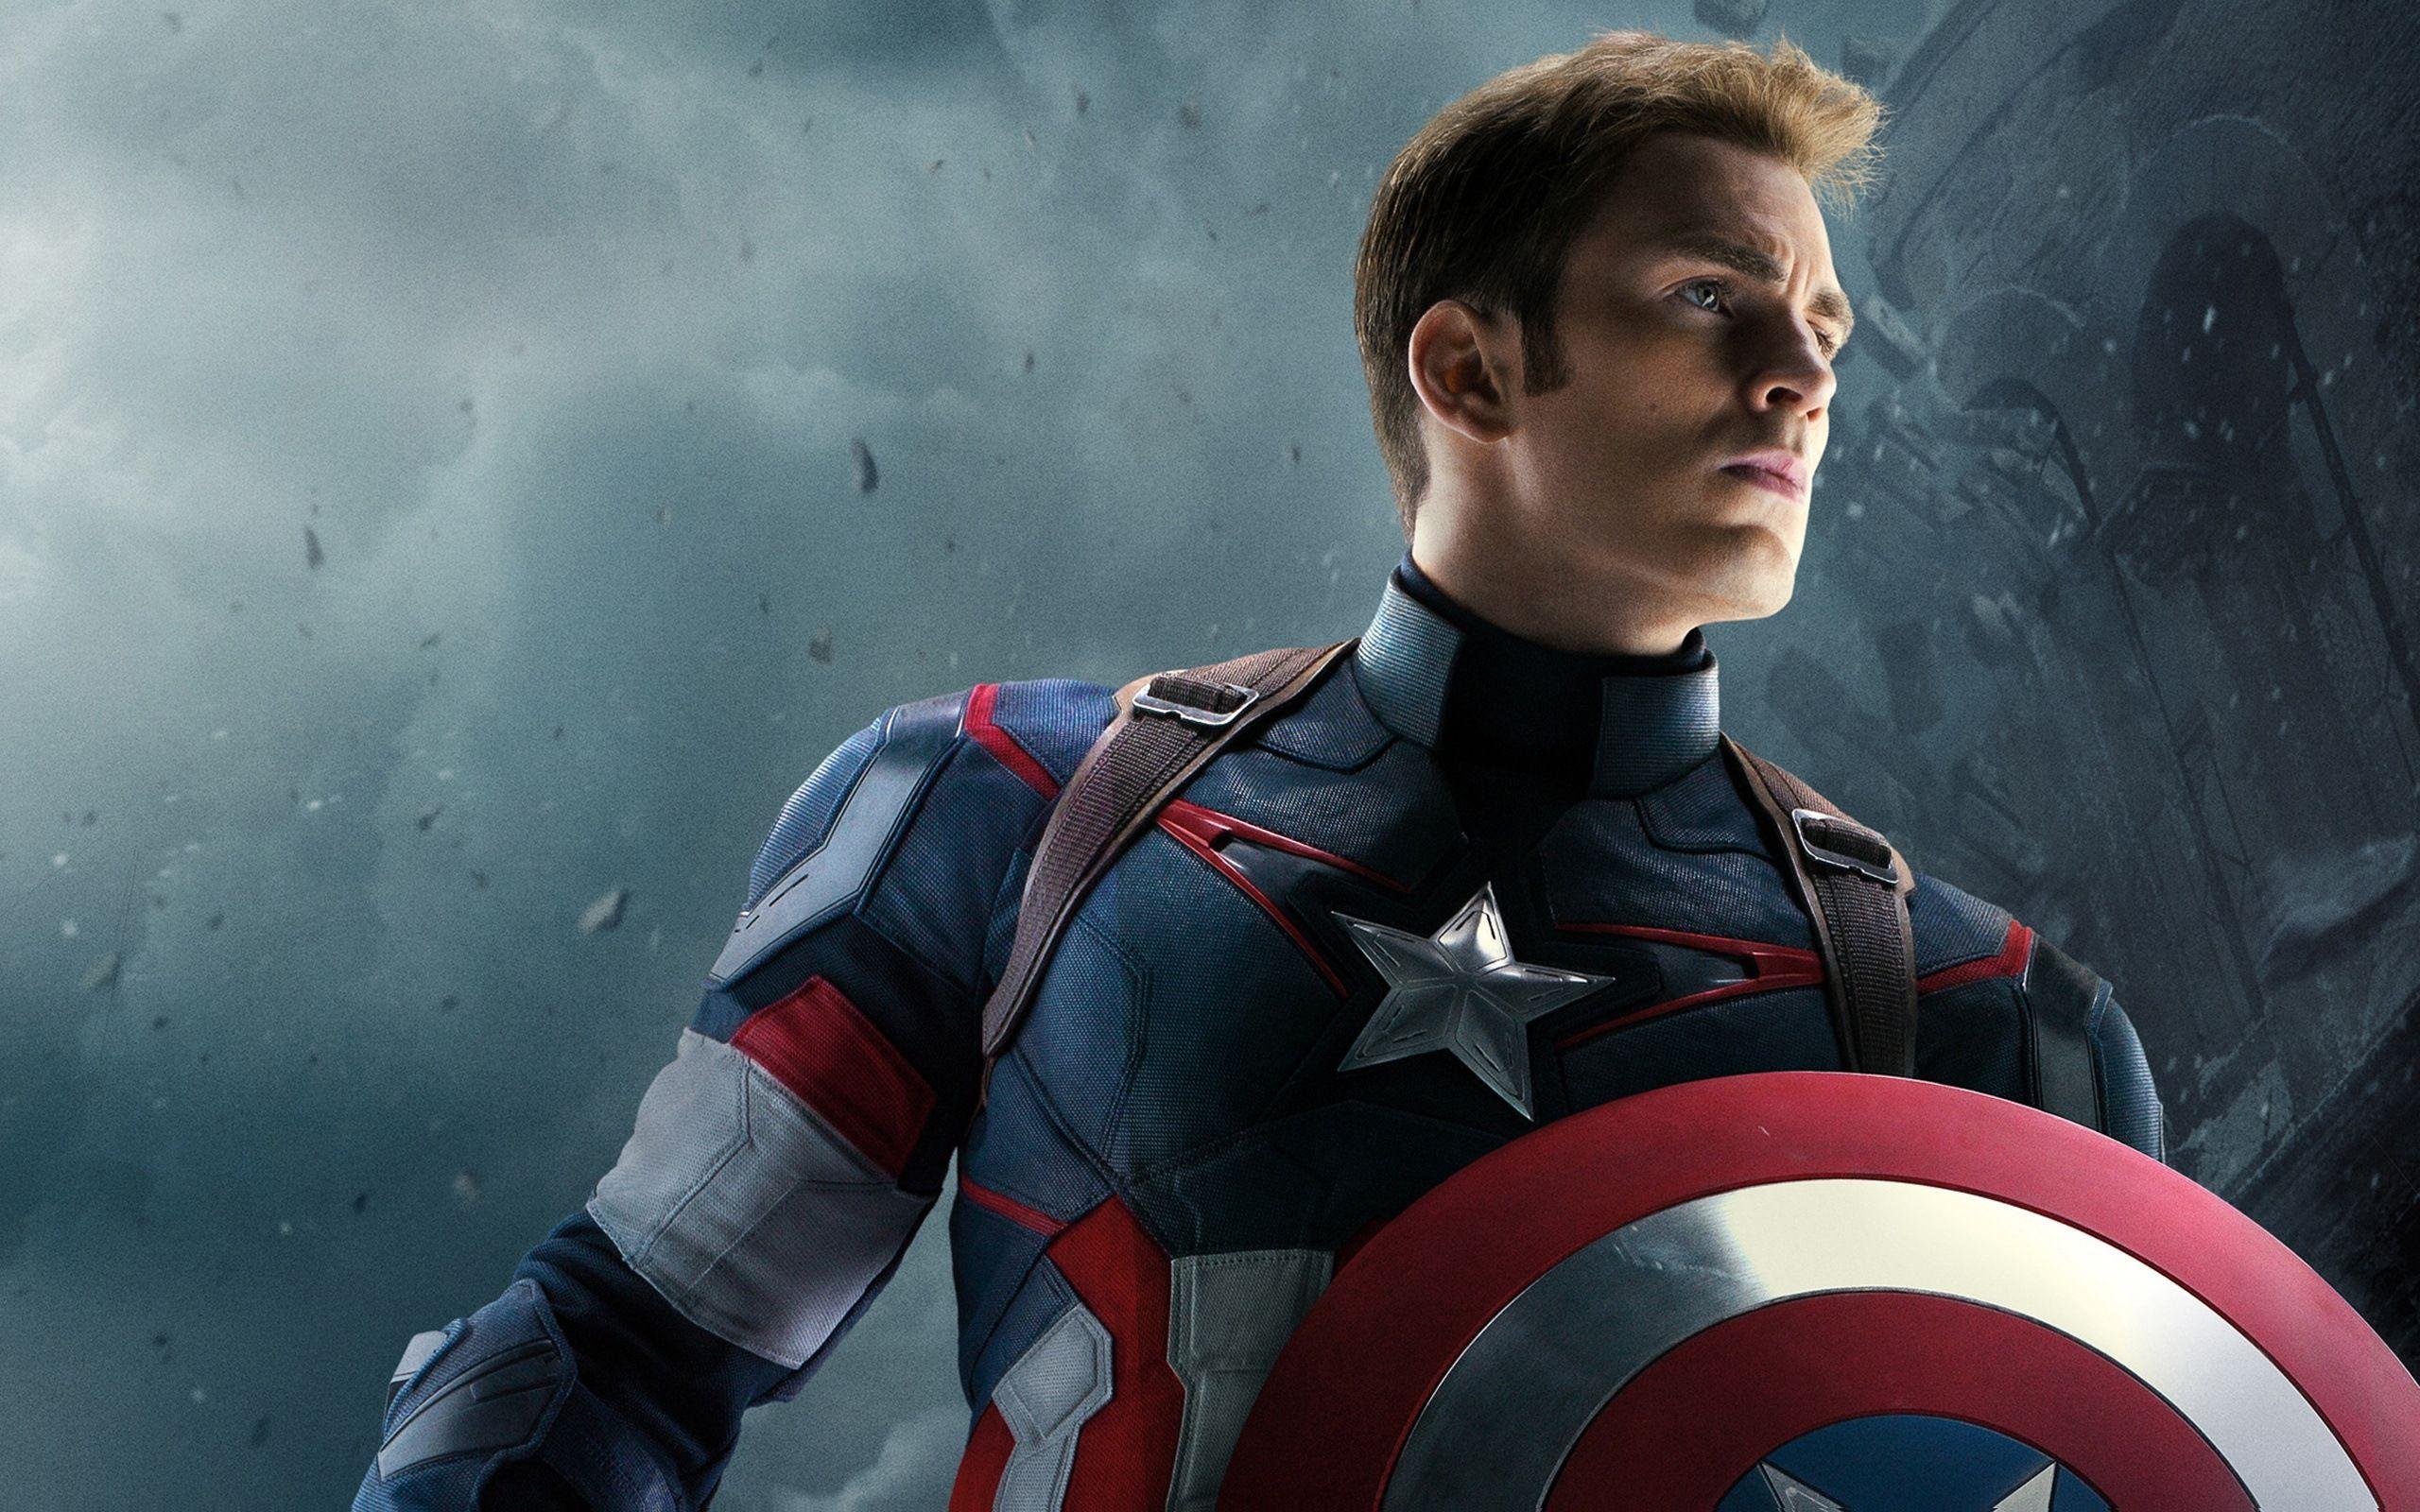 Captain America Avengers 2 Wallpaper   WallpaperHDC.com